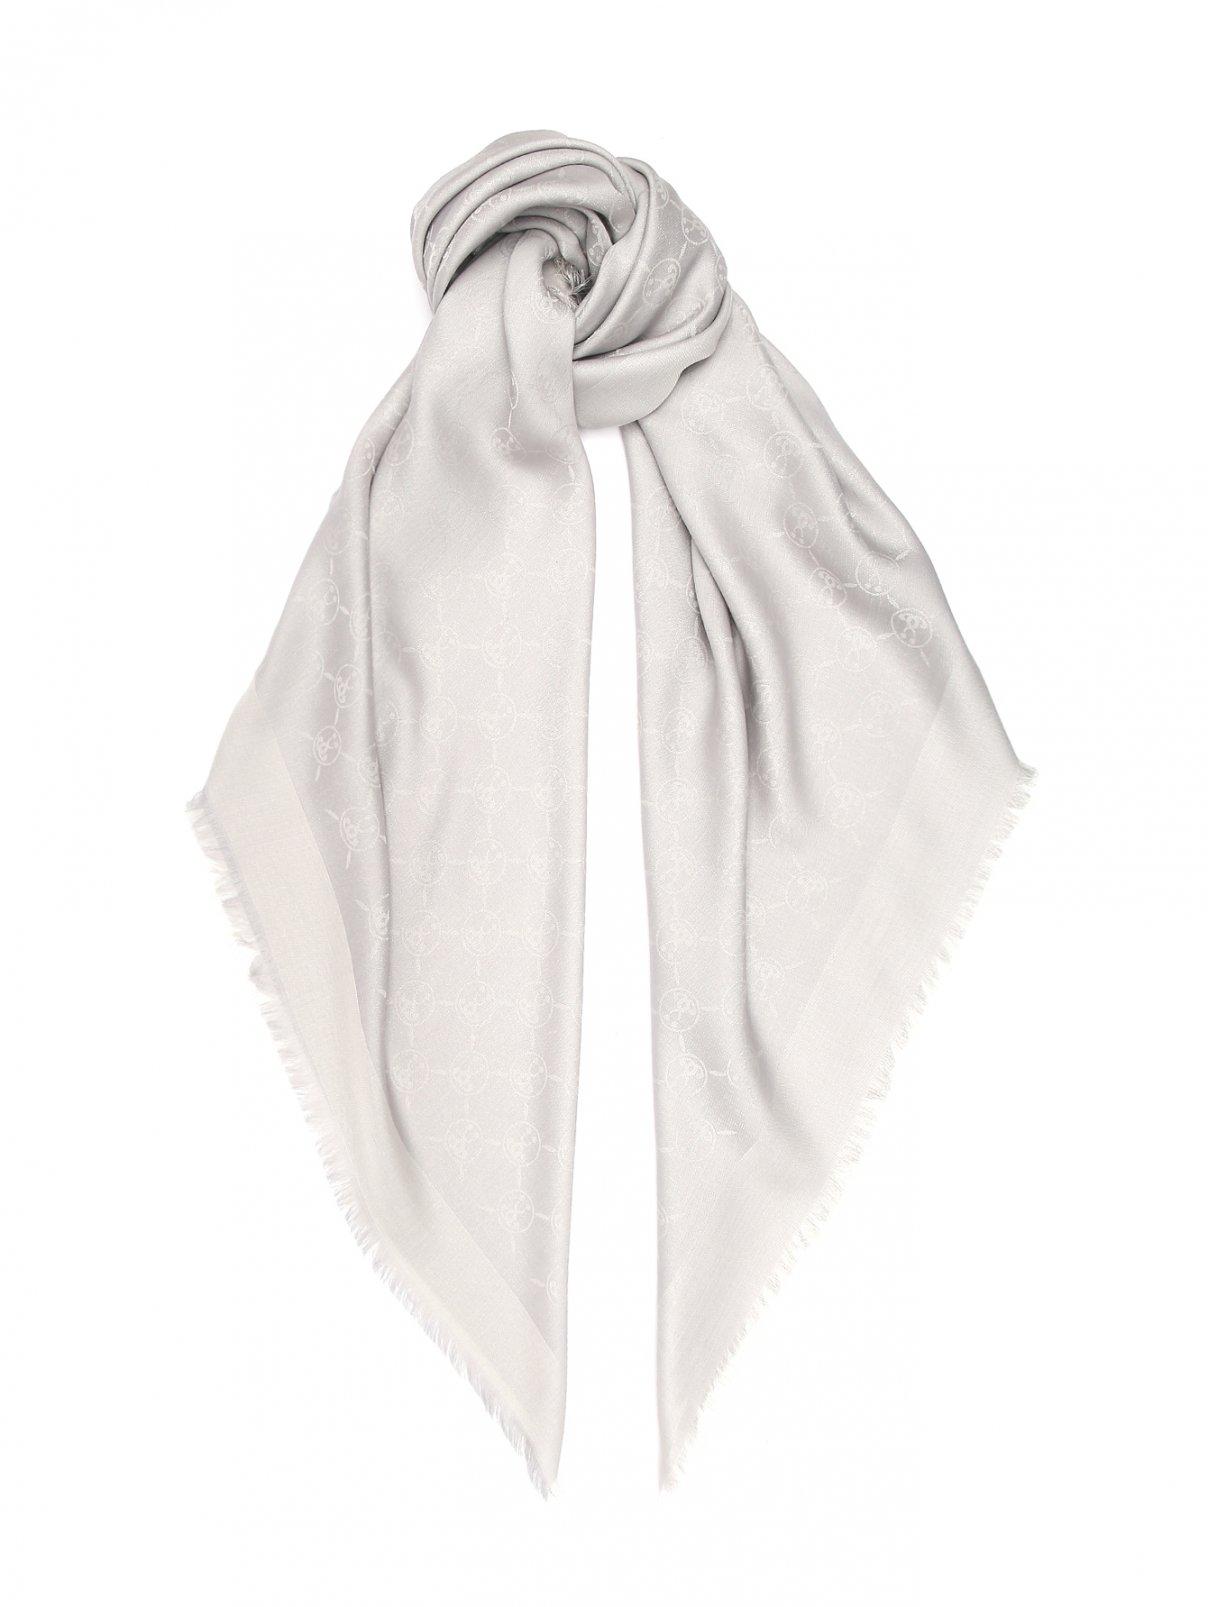 Платок из шерсти шелка и хлопка с бахромой Moschino  –  Общий вид